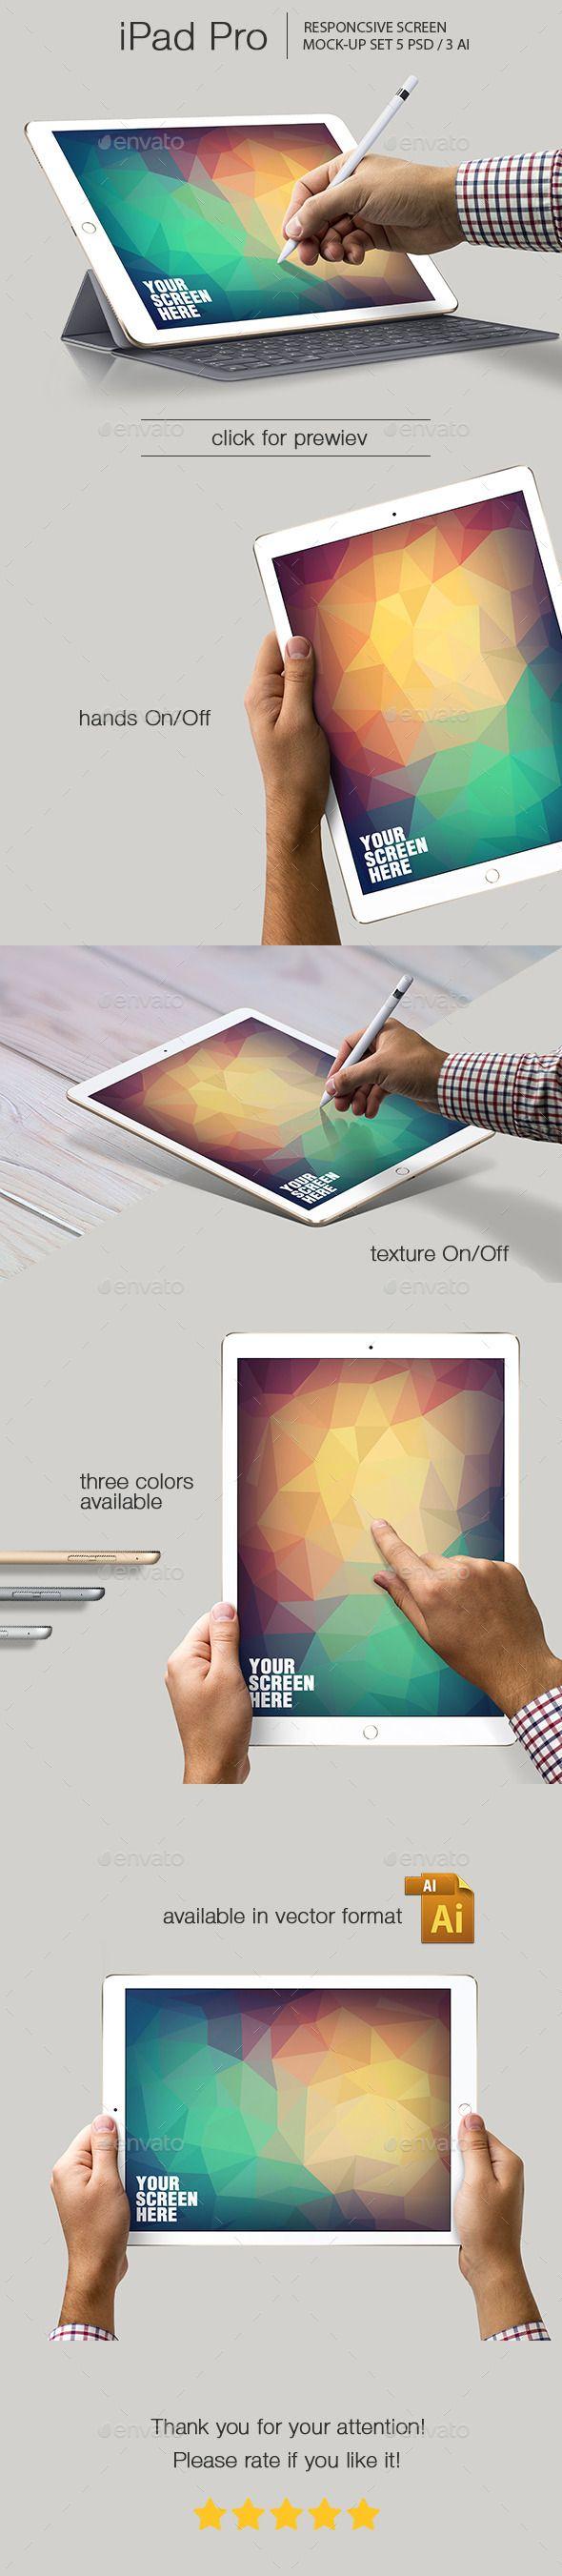 iPad Pro Responsive Mockup